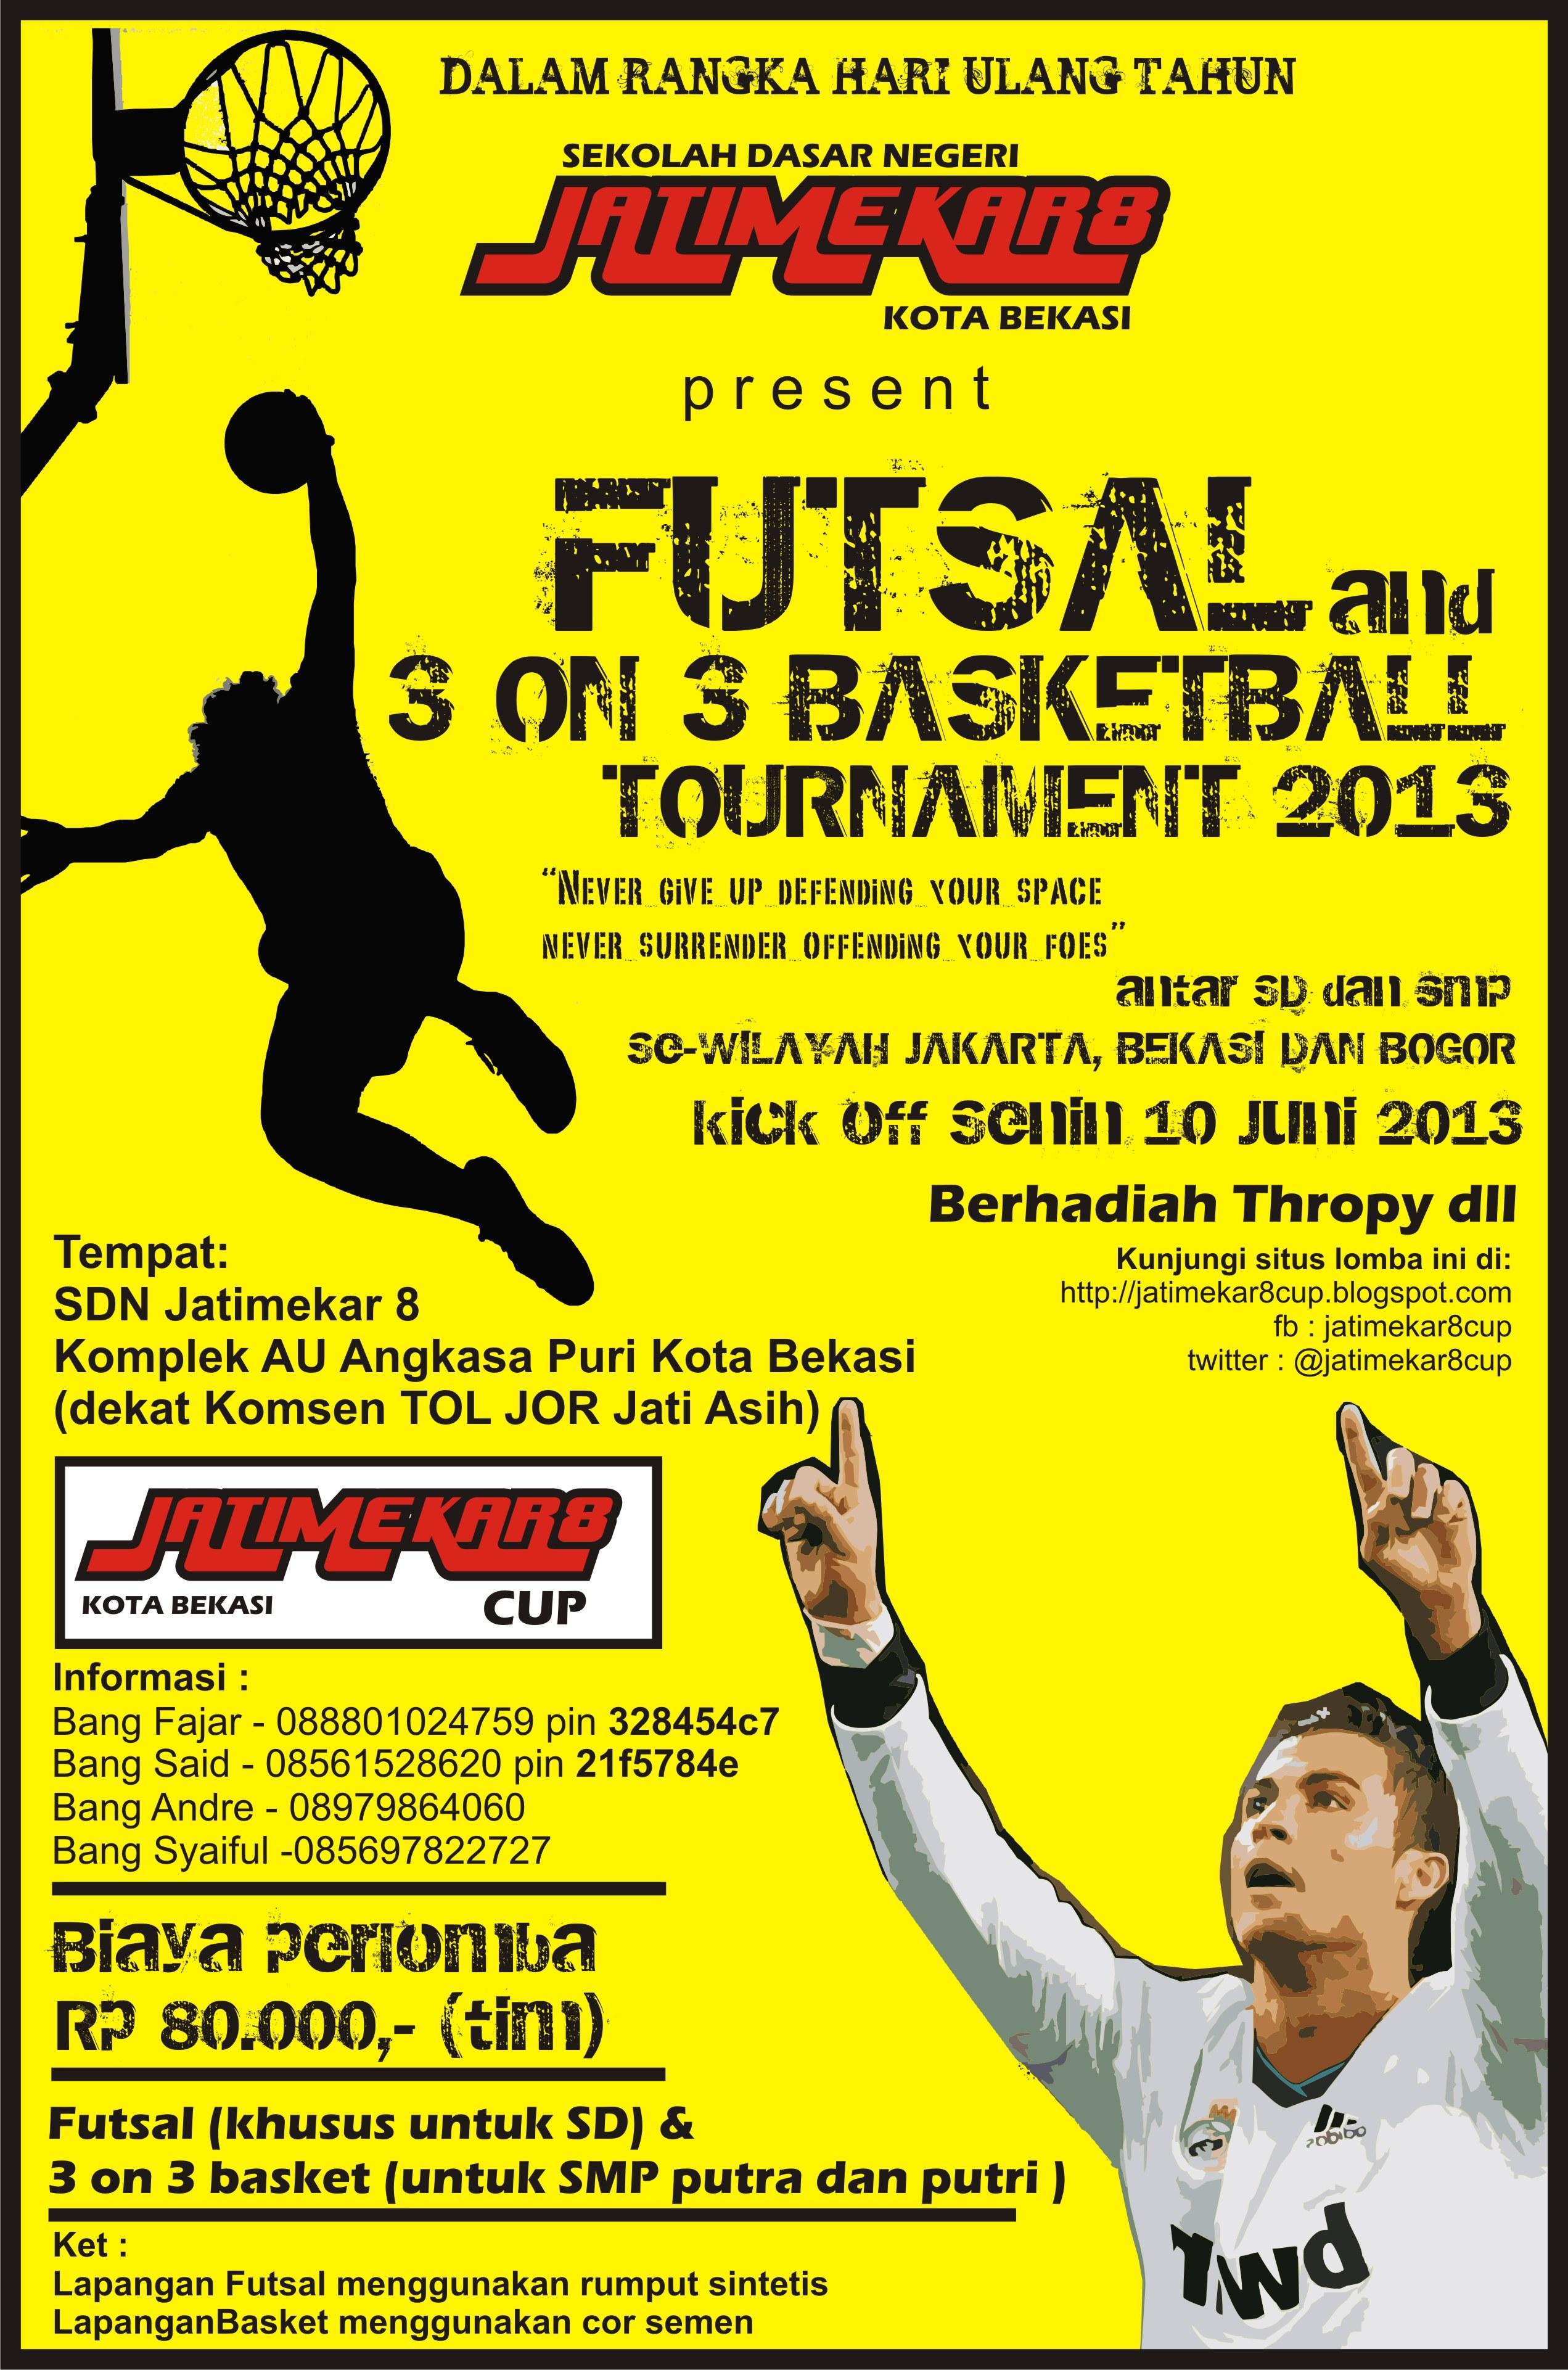 Undangan Futsal dan 3 on 3 Basket Tournament 2013 | Blognya